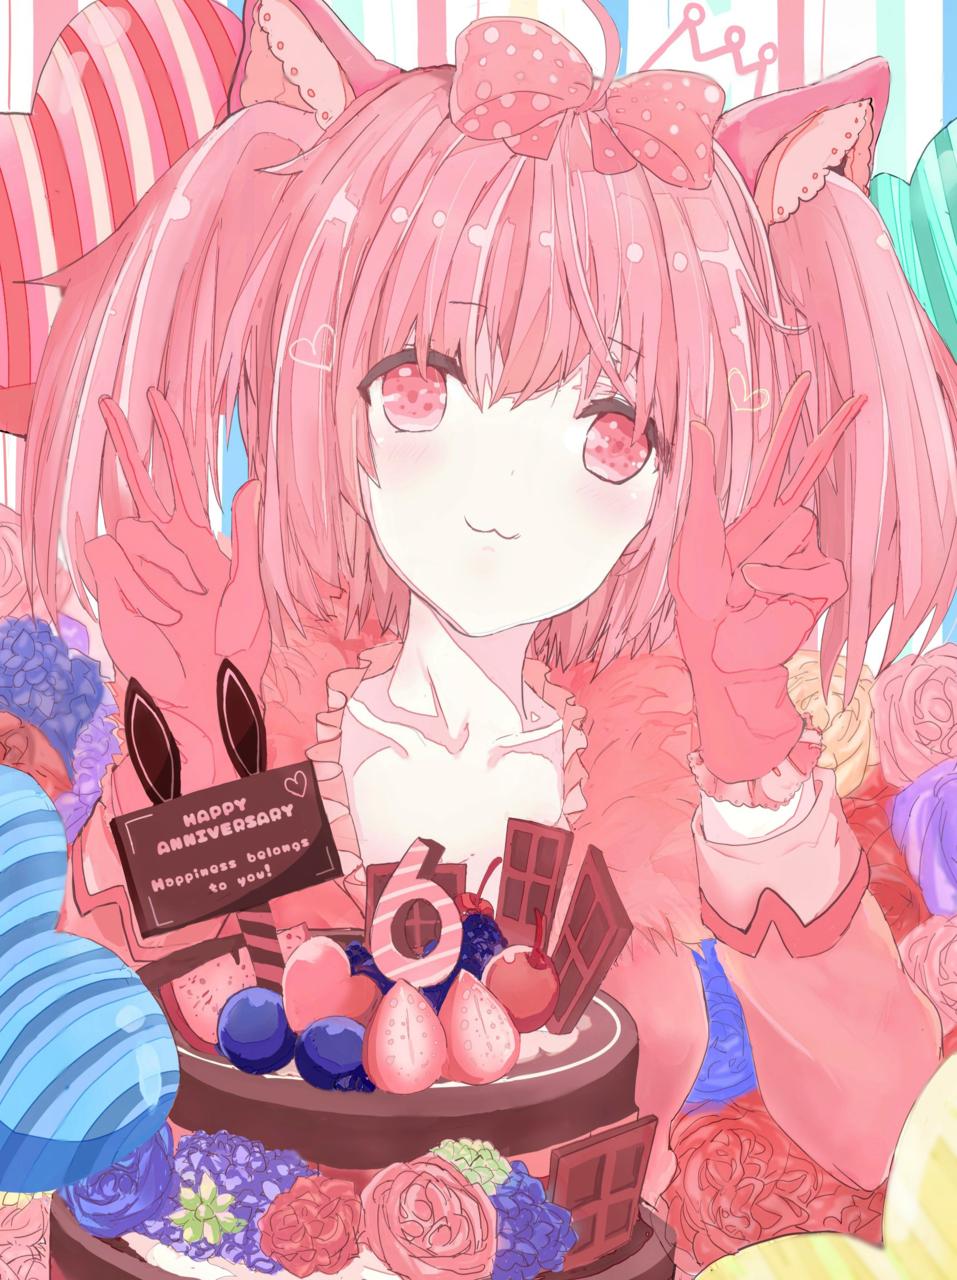 HAPPY ANNIVERSARY♥ Illust of MR 10 July2020_Contest:Anniversary medibangpaint cute girl pink